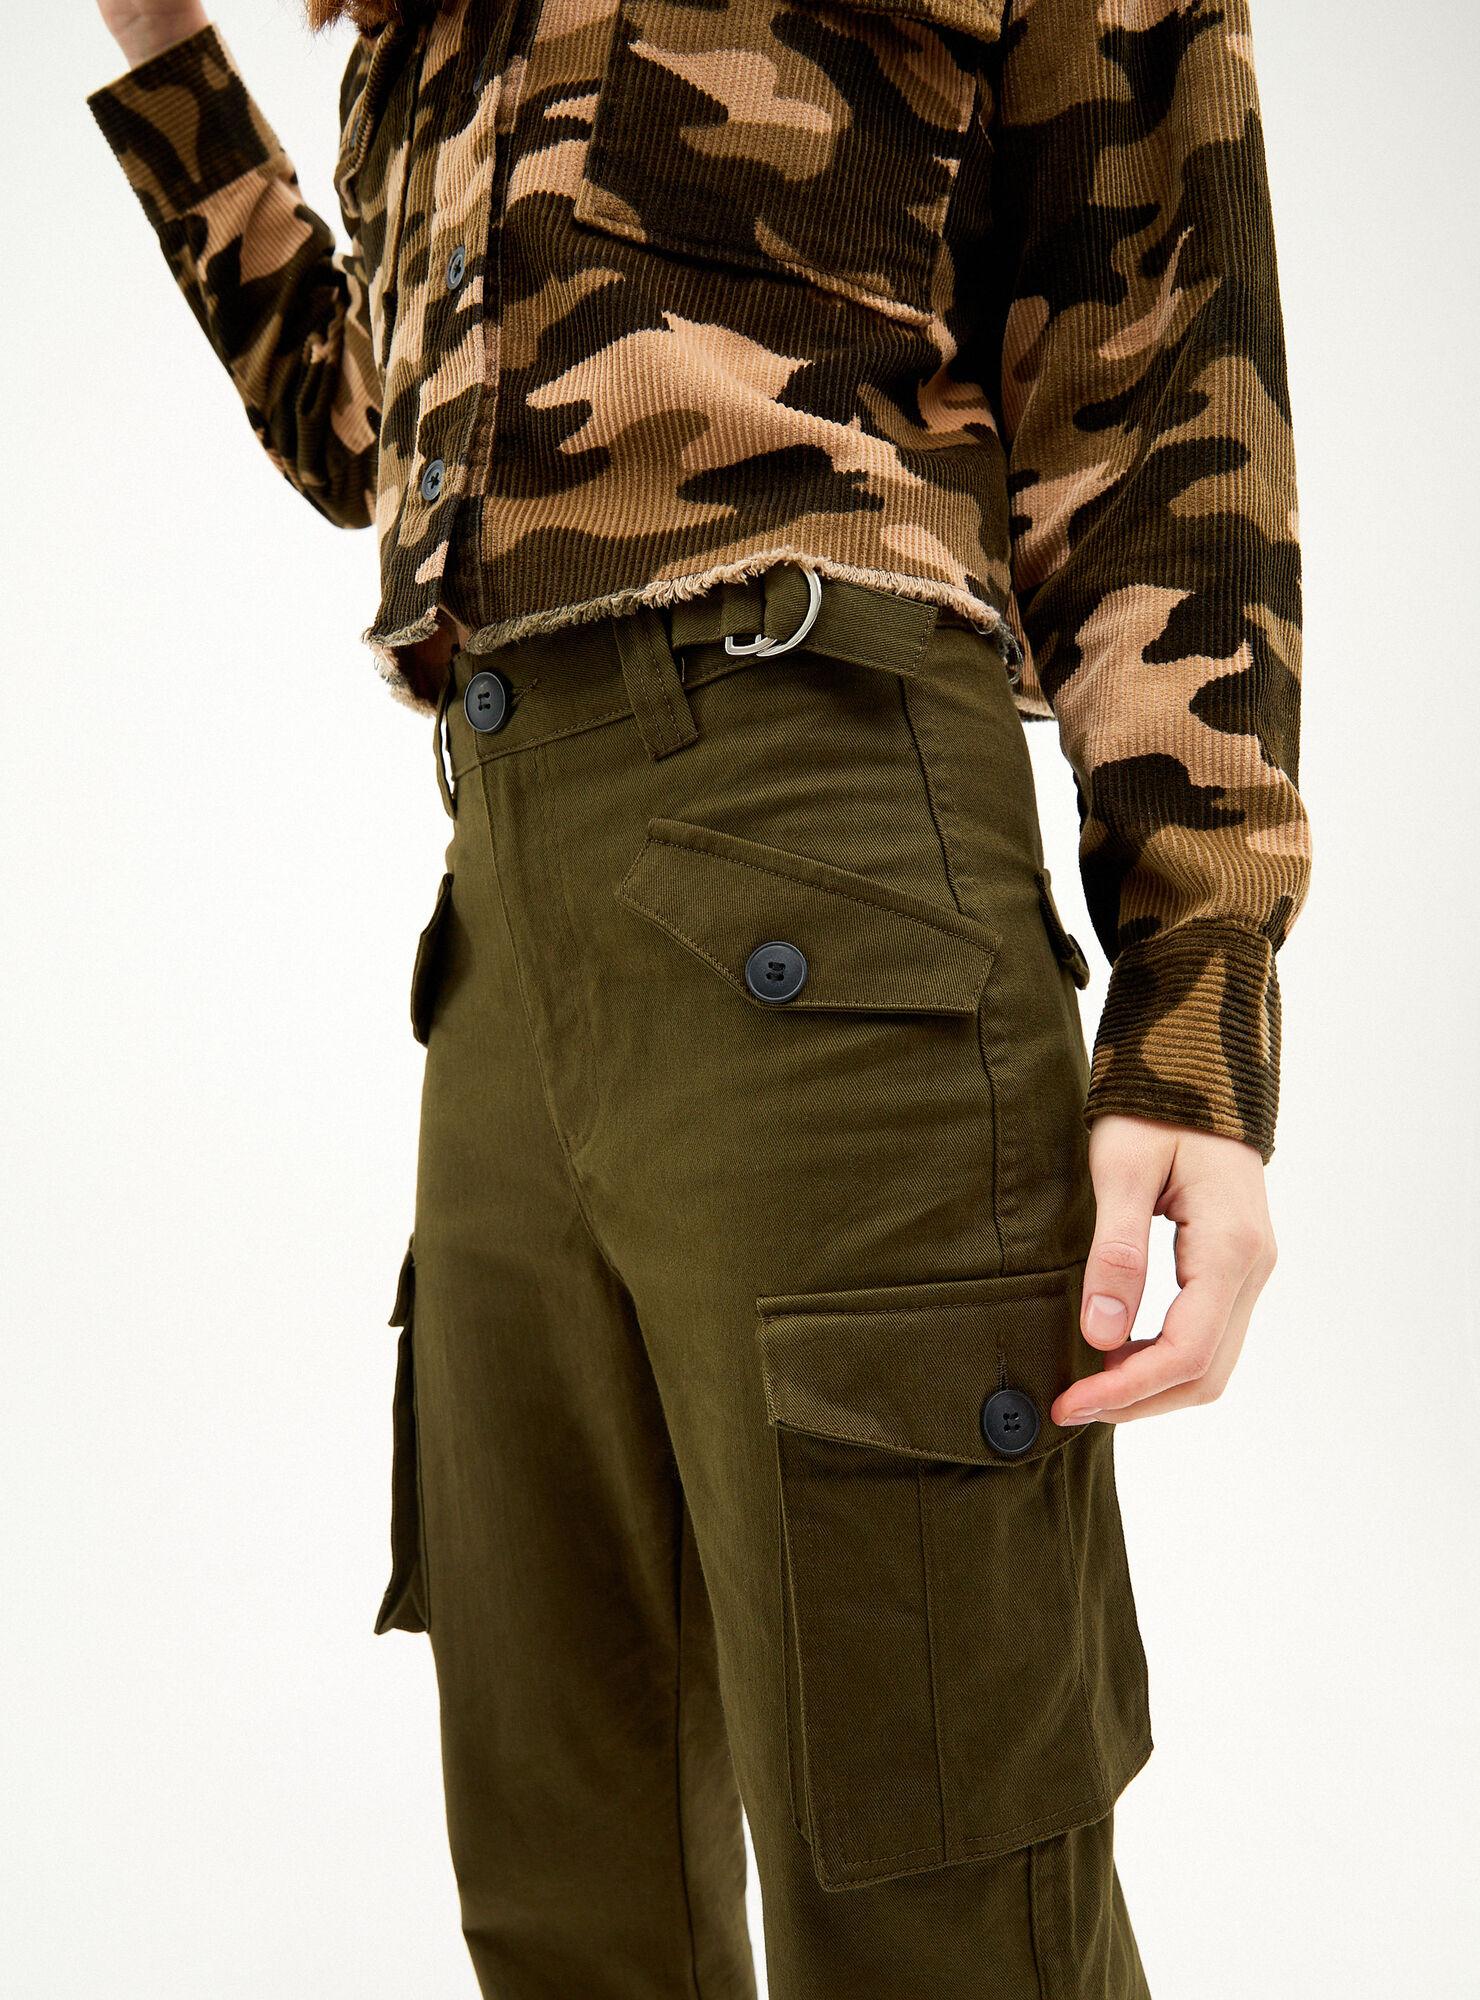 Pantalon Cargo Bershka Jeans Y Pantalones Paris Cl